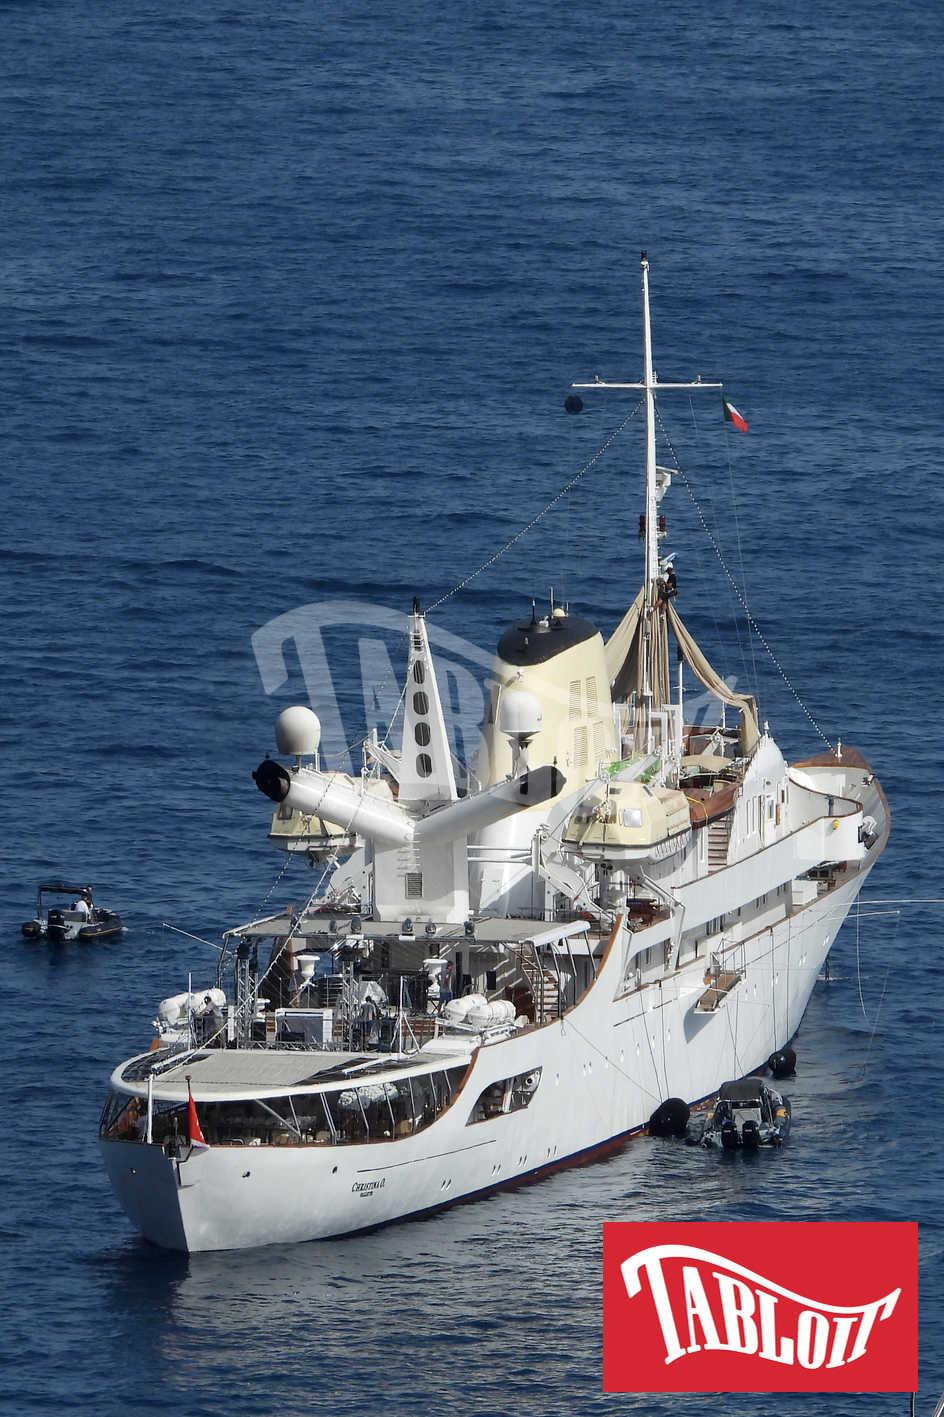 yacht christina o heidi klum